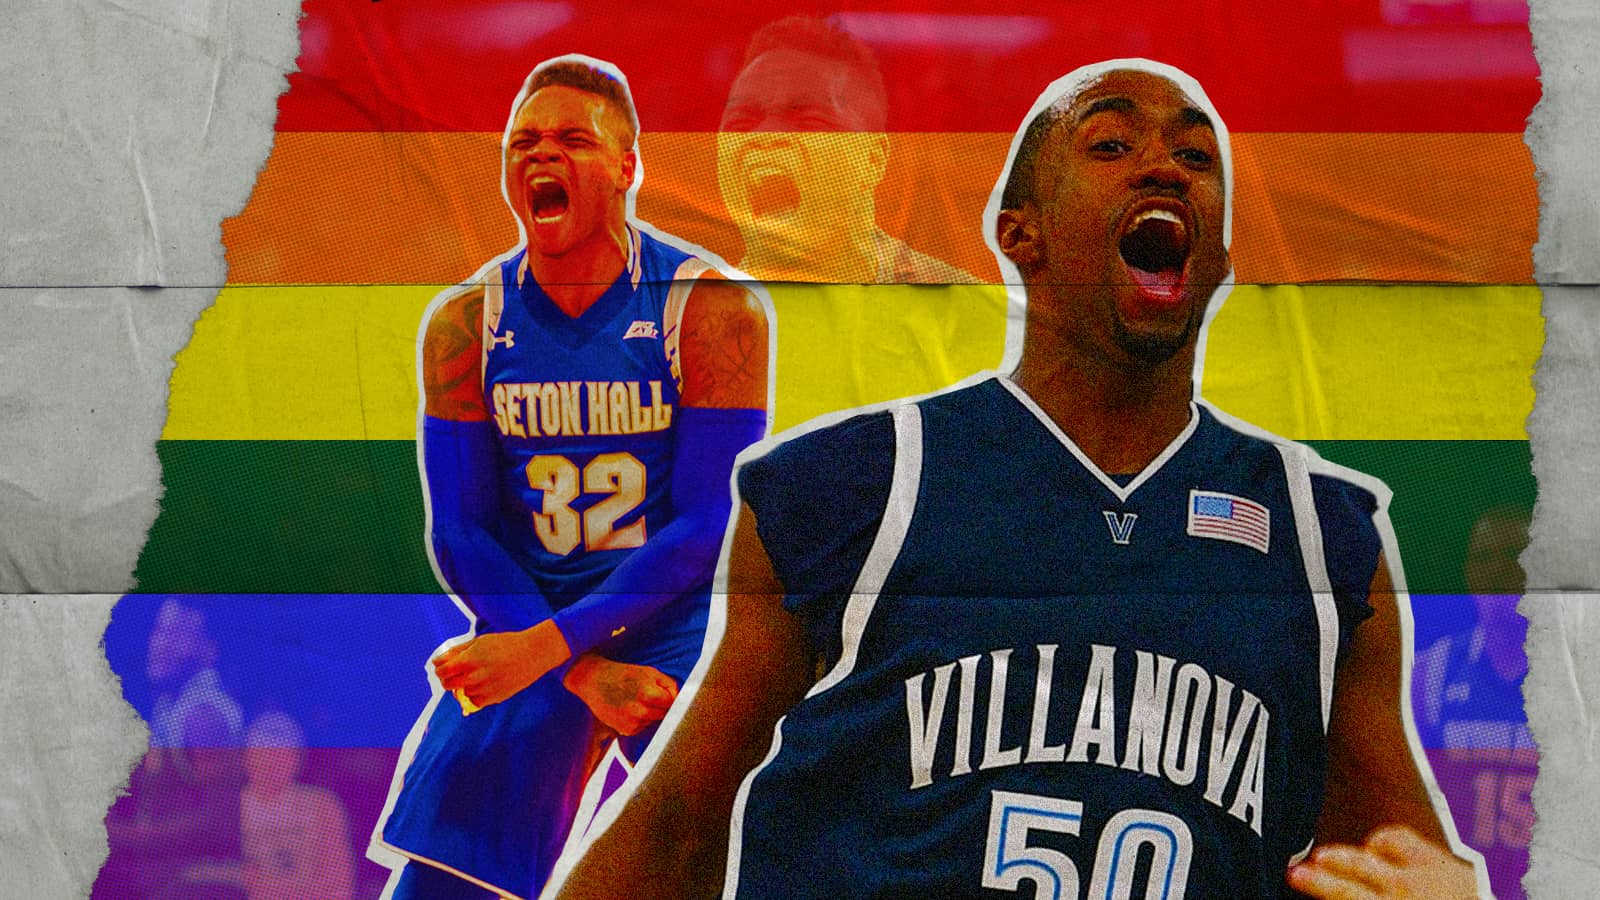 NCAA basketball per LGBTQ